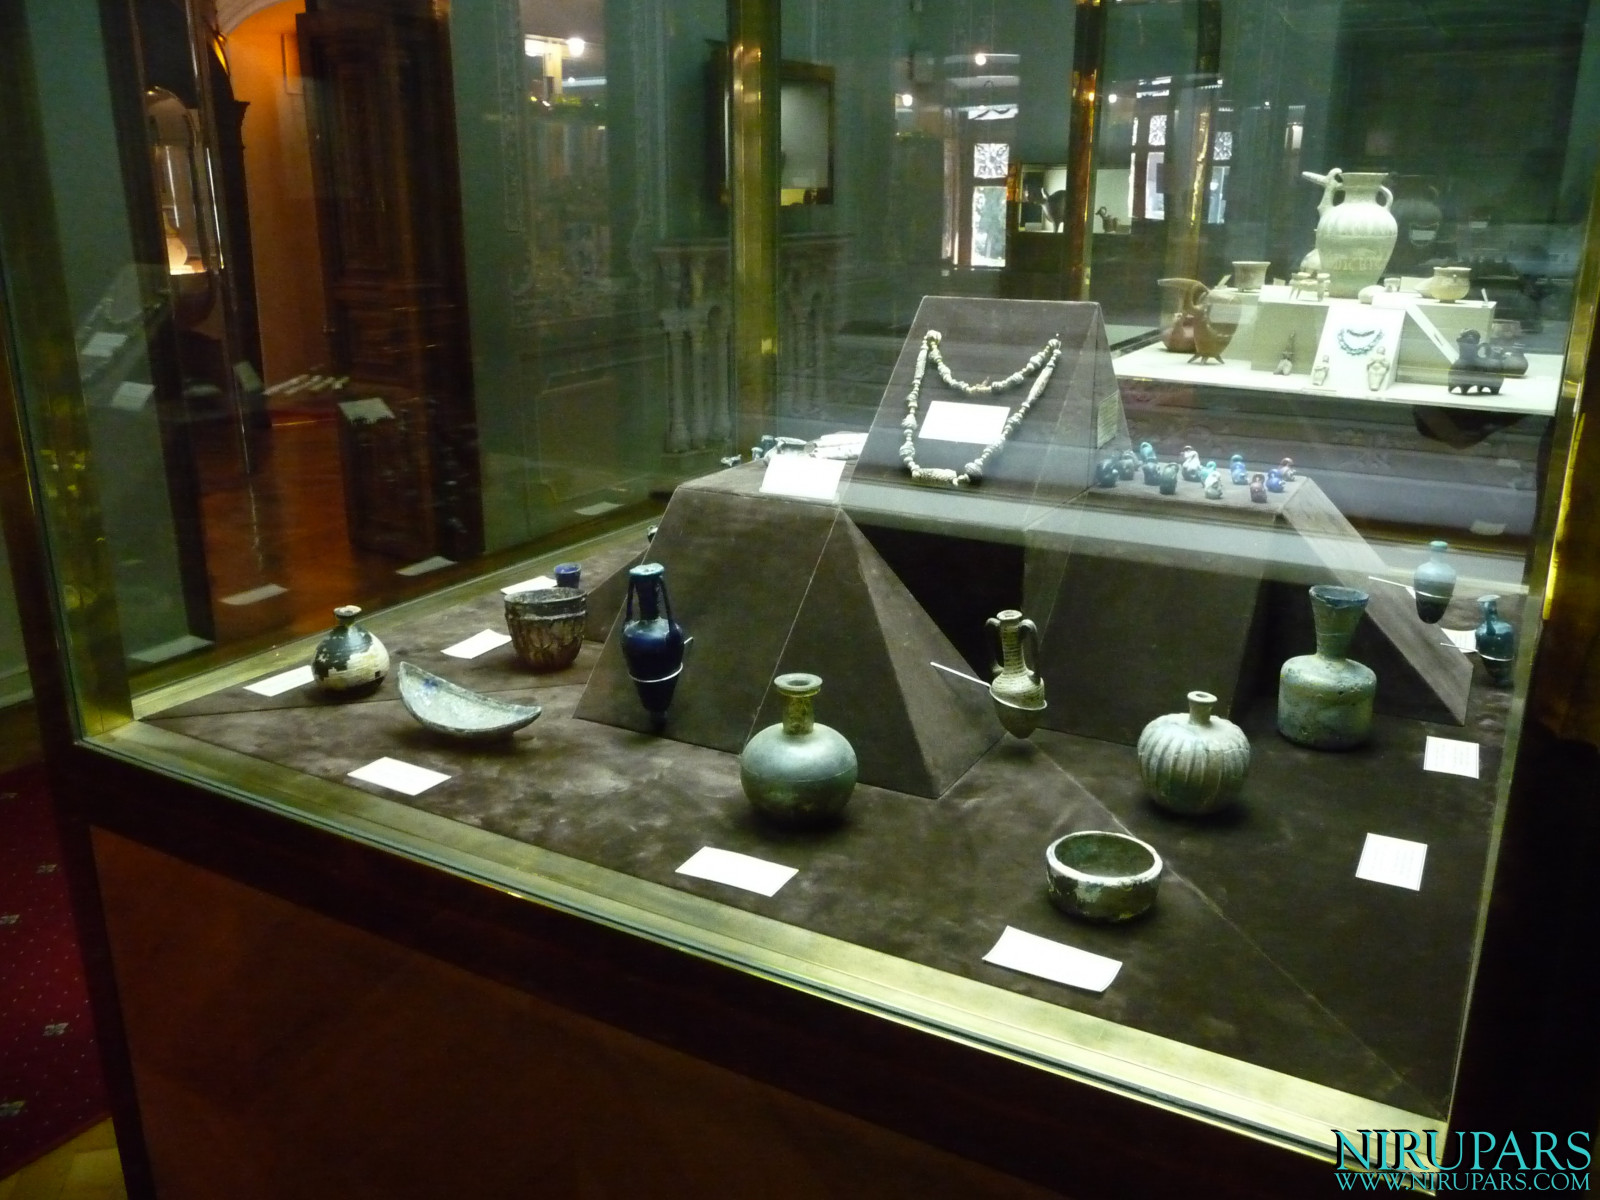 Glassware and Ceramic Museum - Vessels